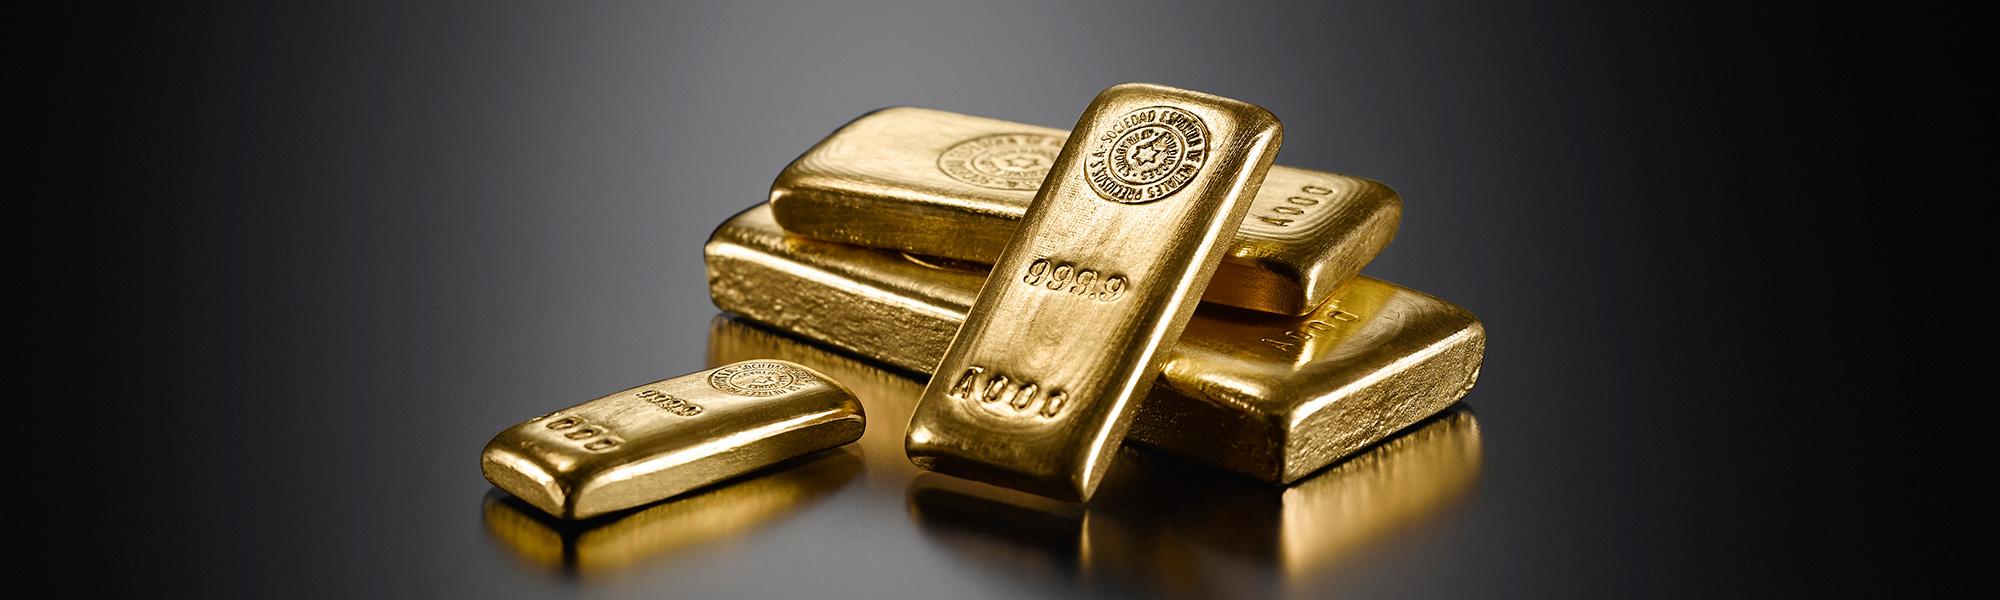 Comprar Lingotes de Oro online